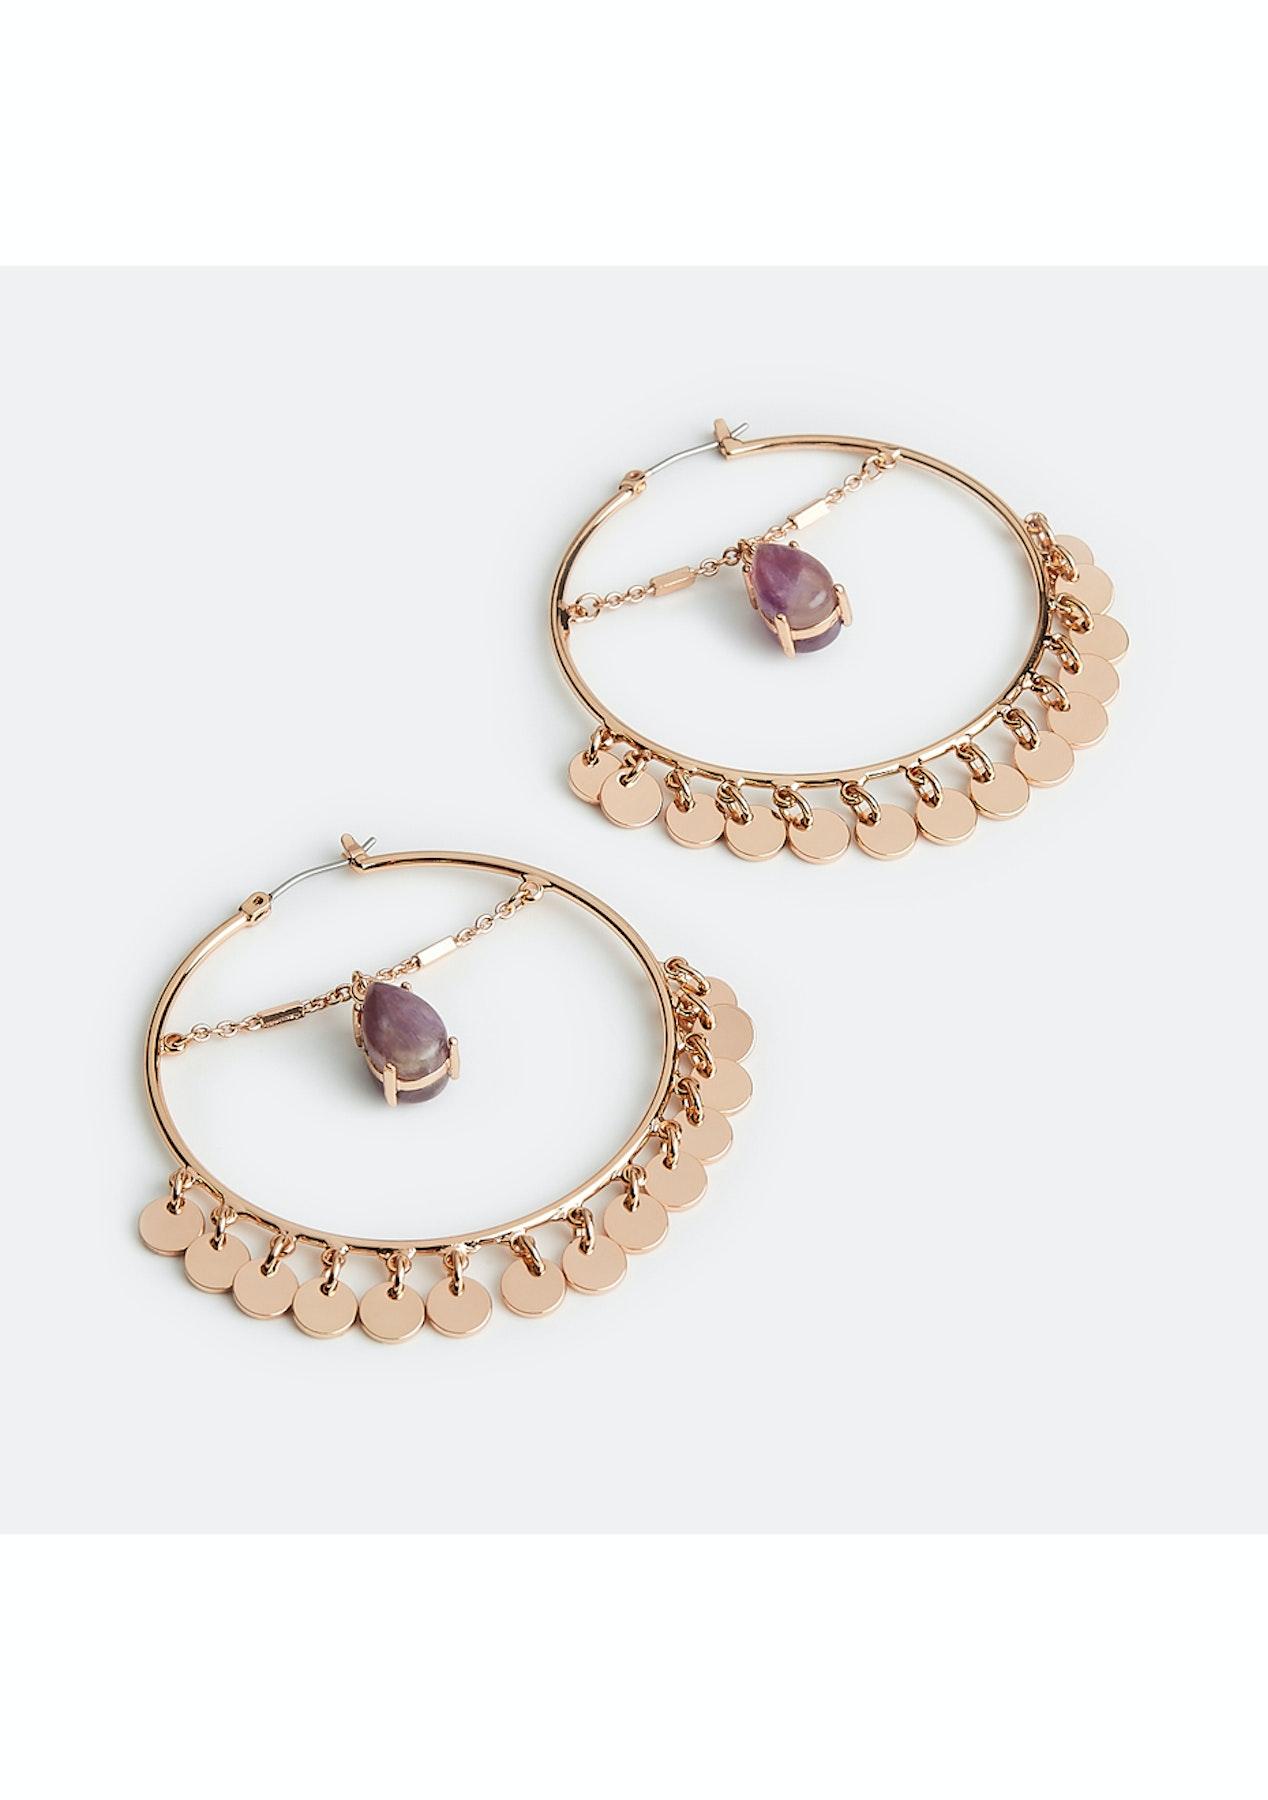 Samantha Wills Kaleidoscope Hoop Earrings From 29 95 Onceit